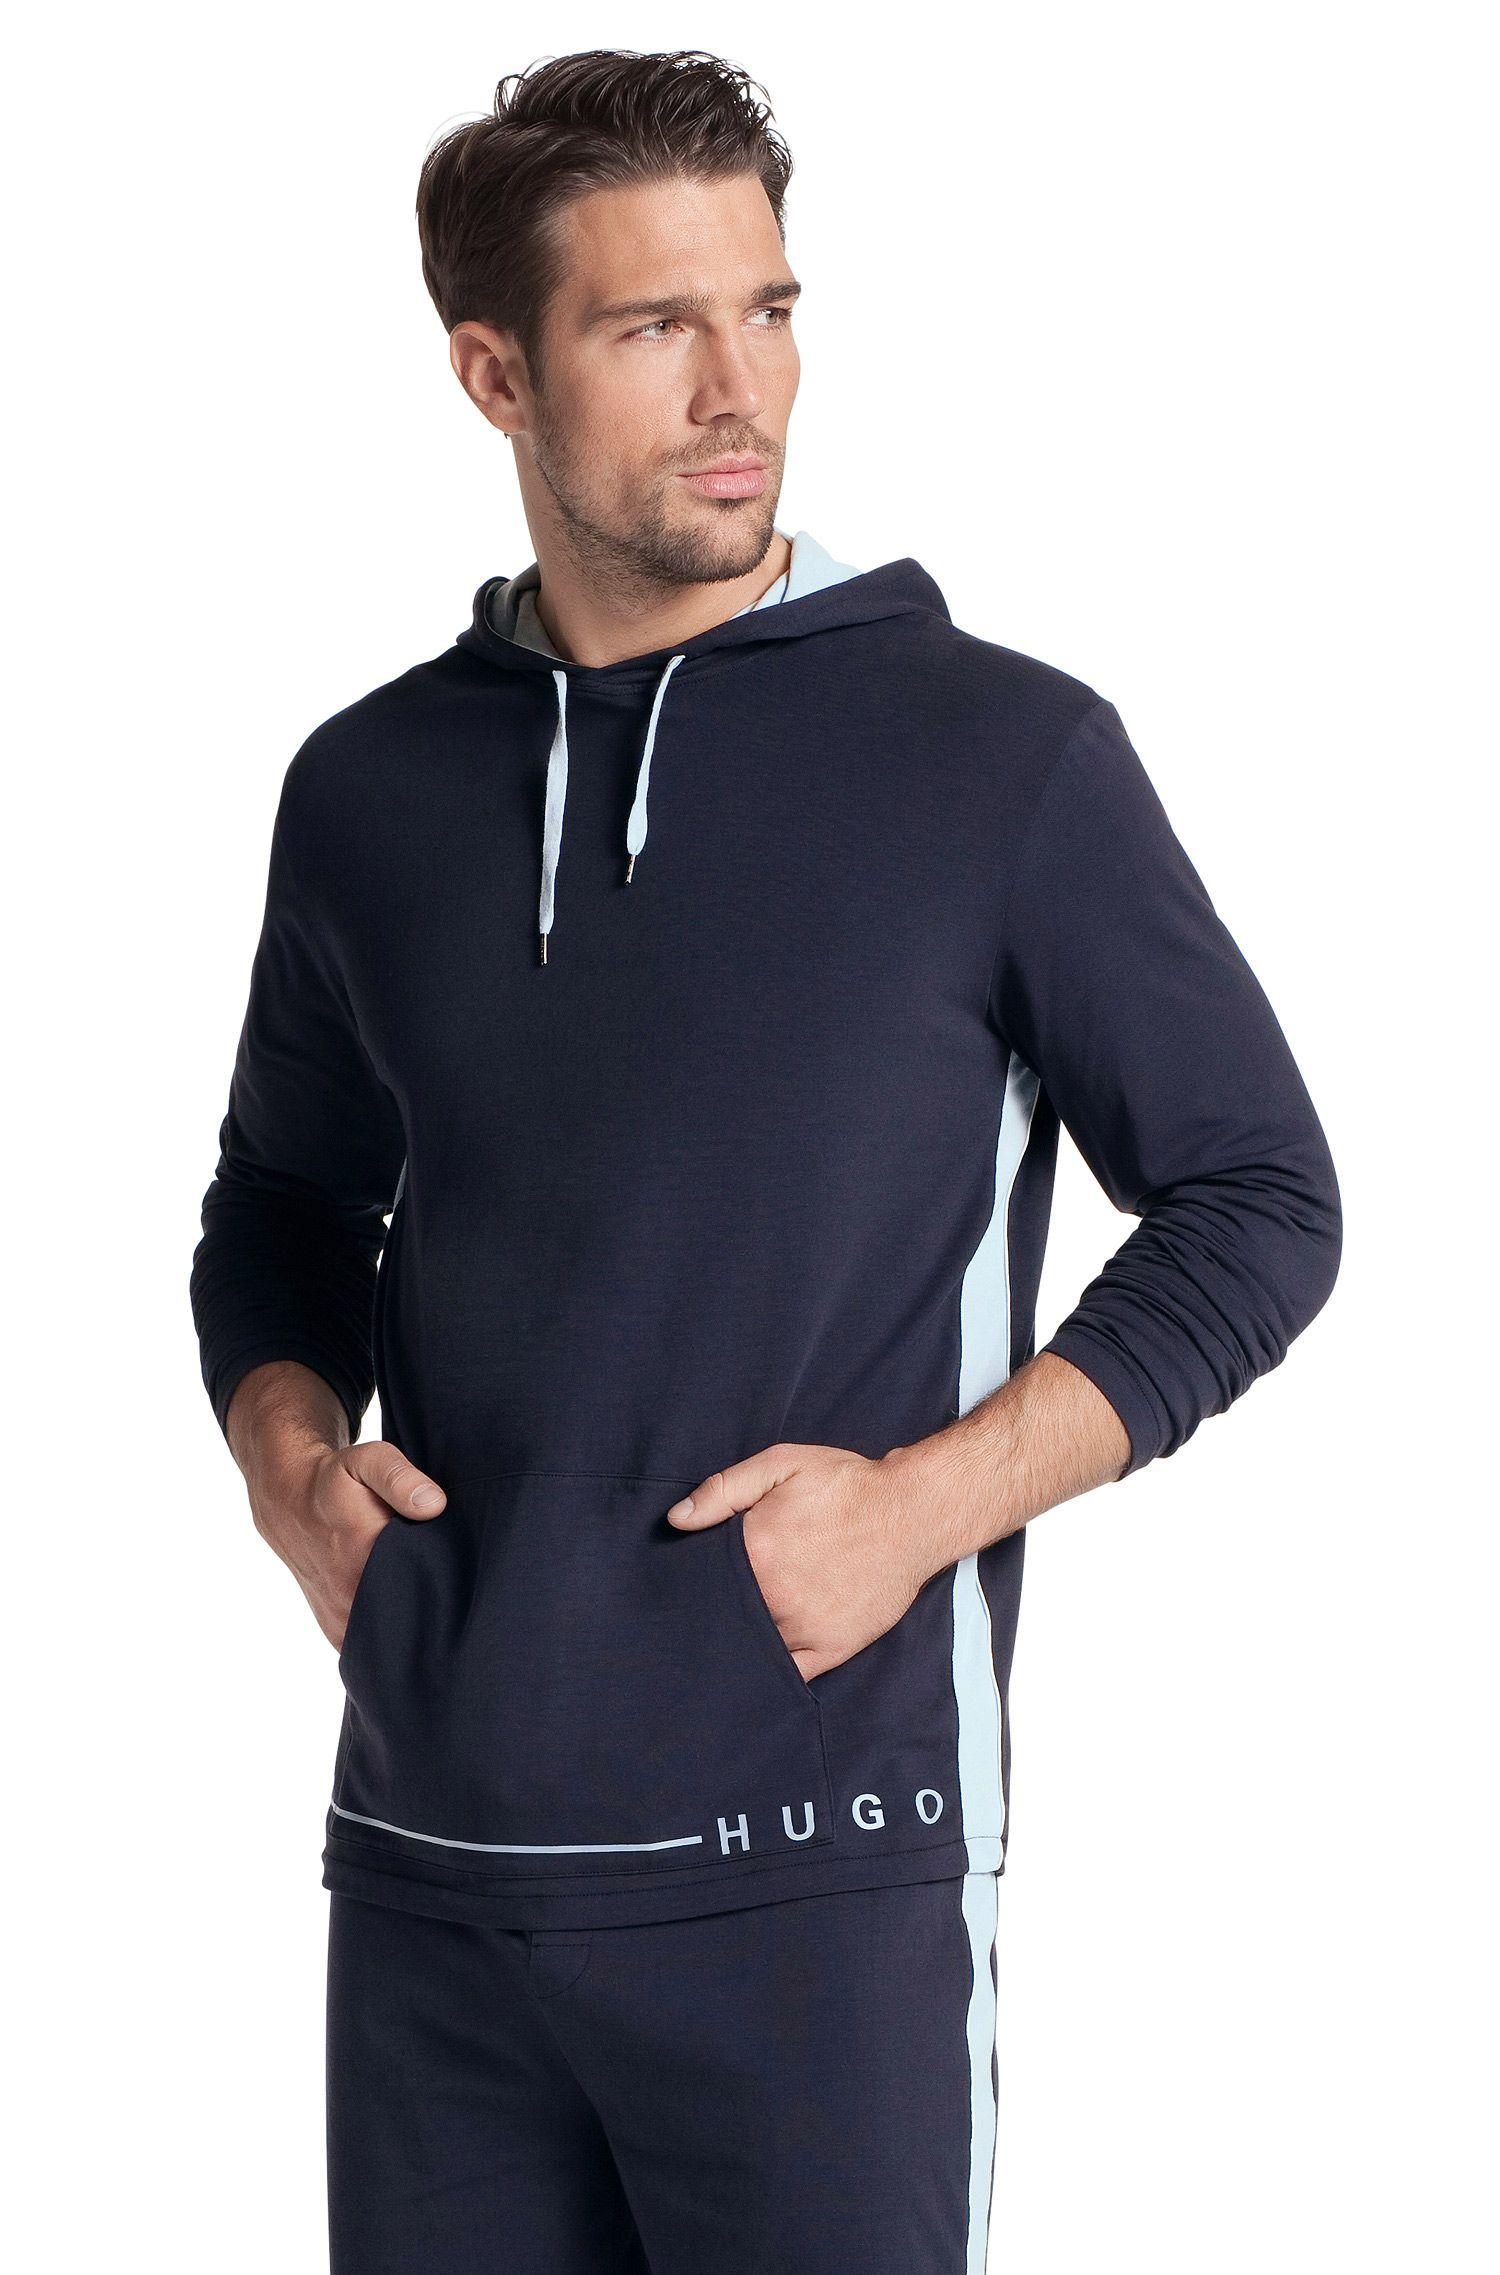 Sweat-shirt à capuche, Shirt Hooded LS BM, Bleu foncé